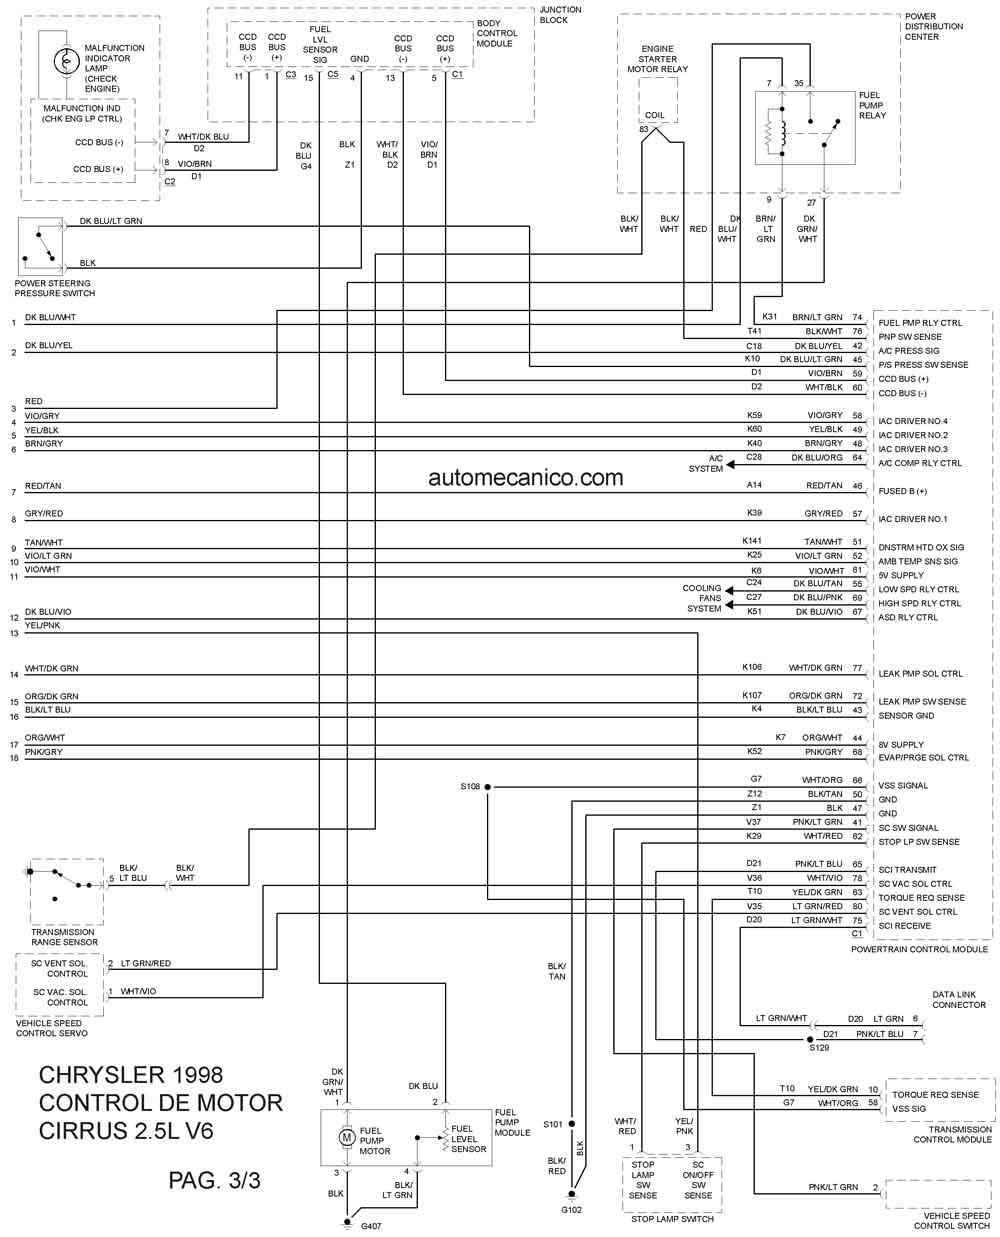 99 Dodge Intrepid Wiring Diagram Chrysler 1998 Diagramas Esquemas Graphics